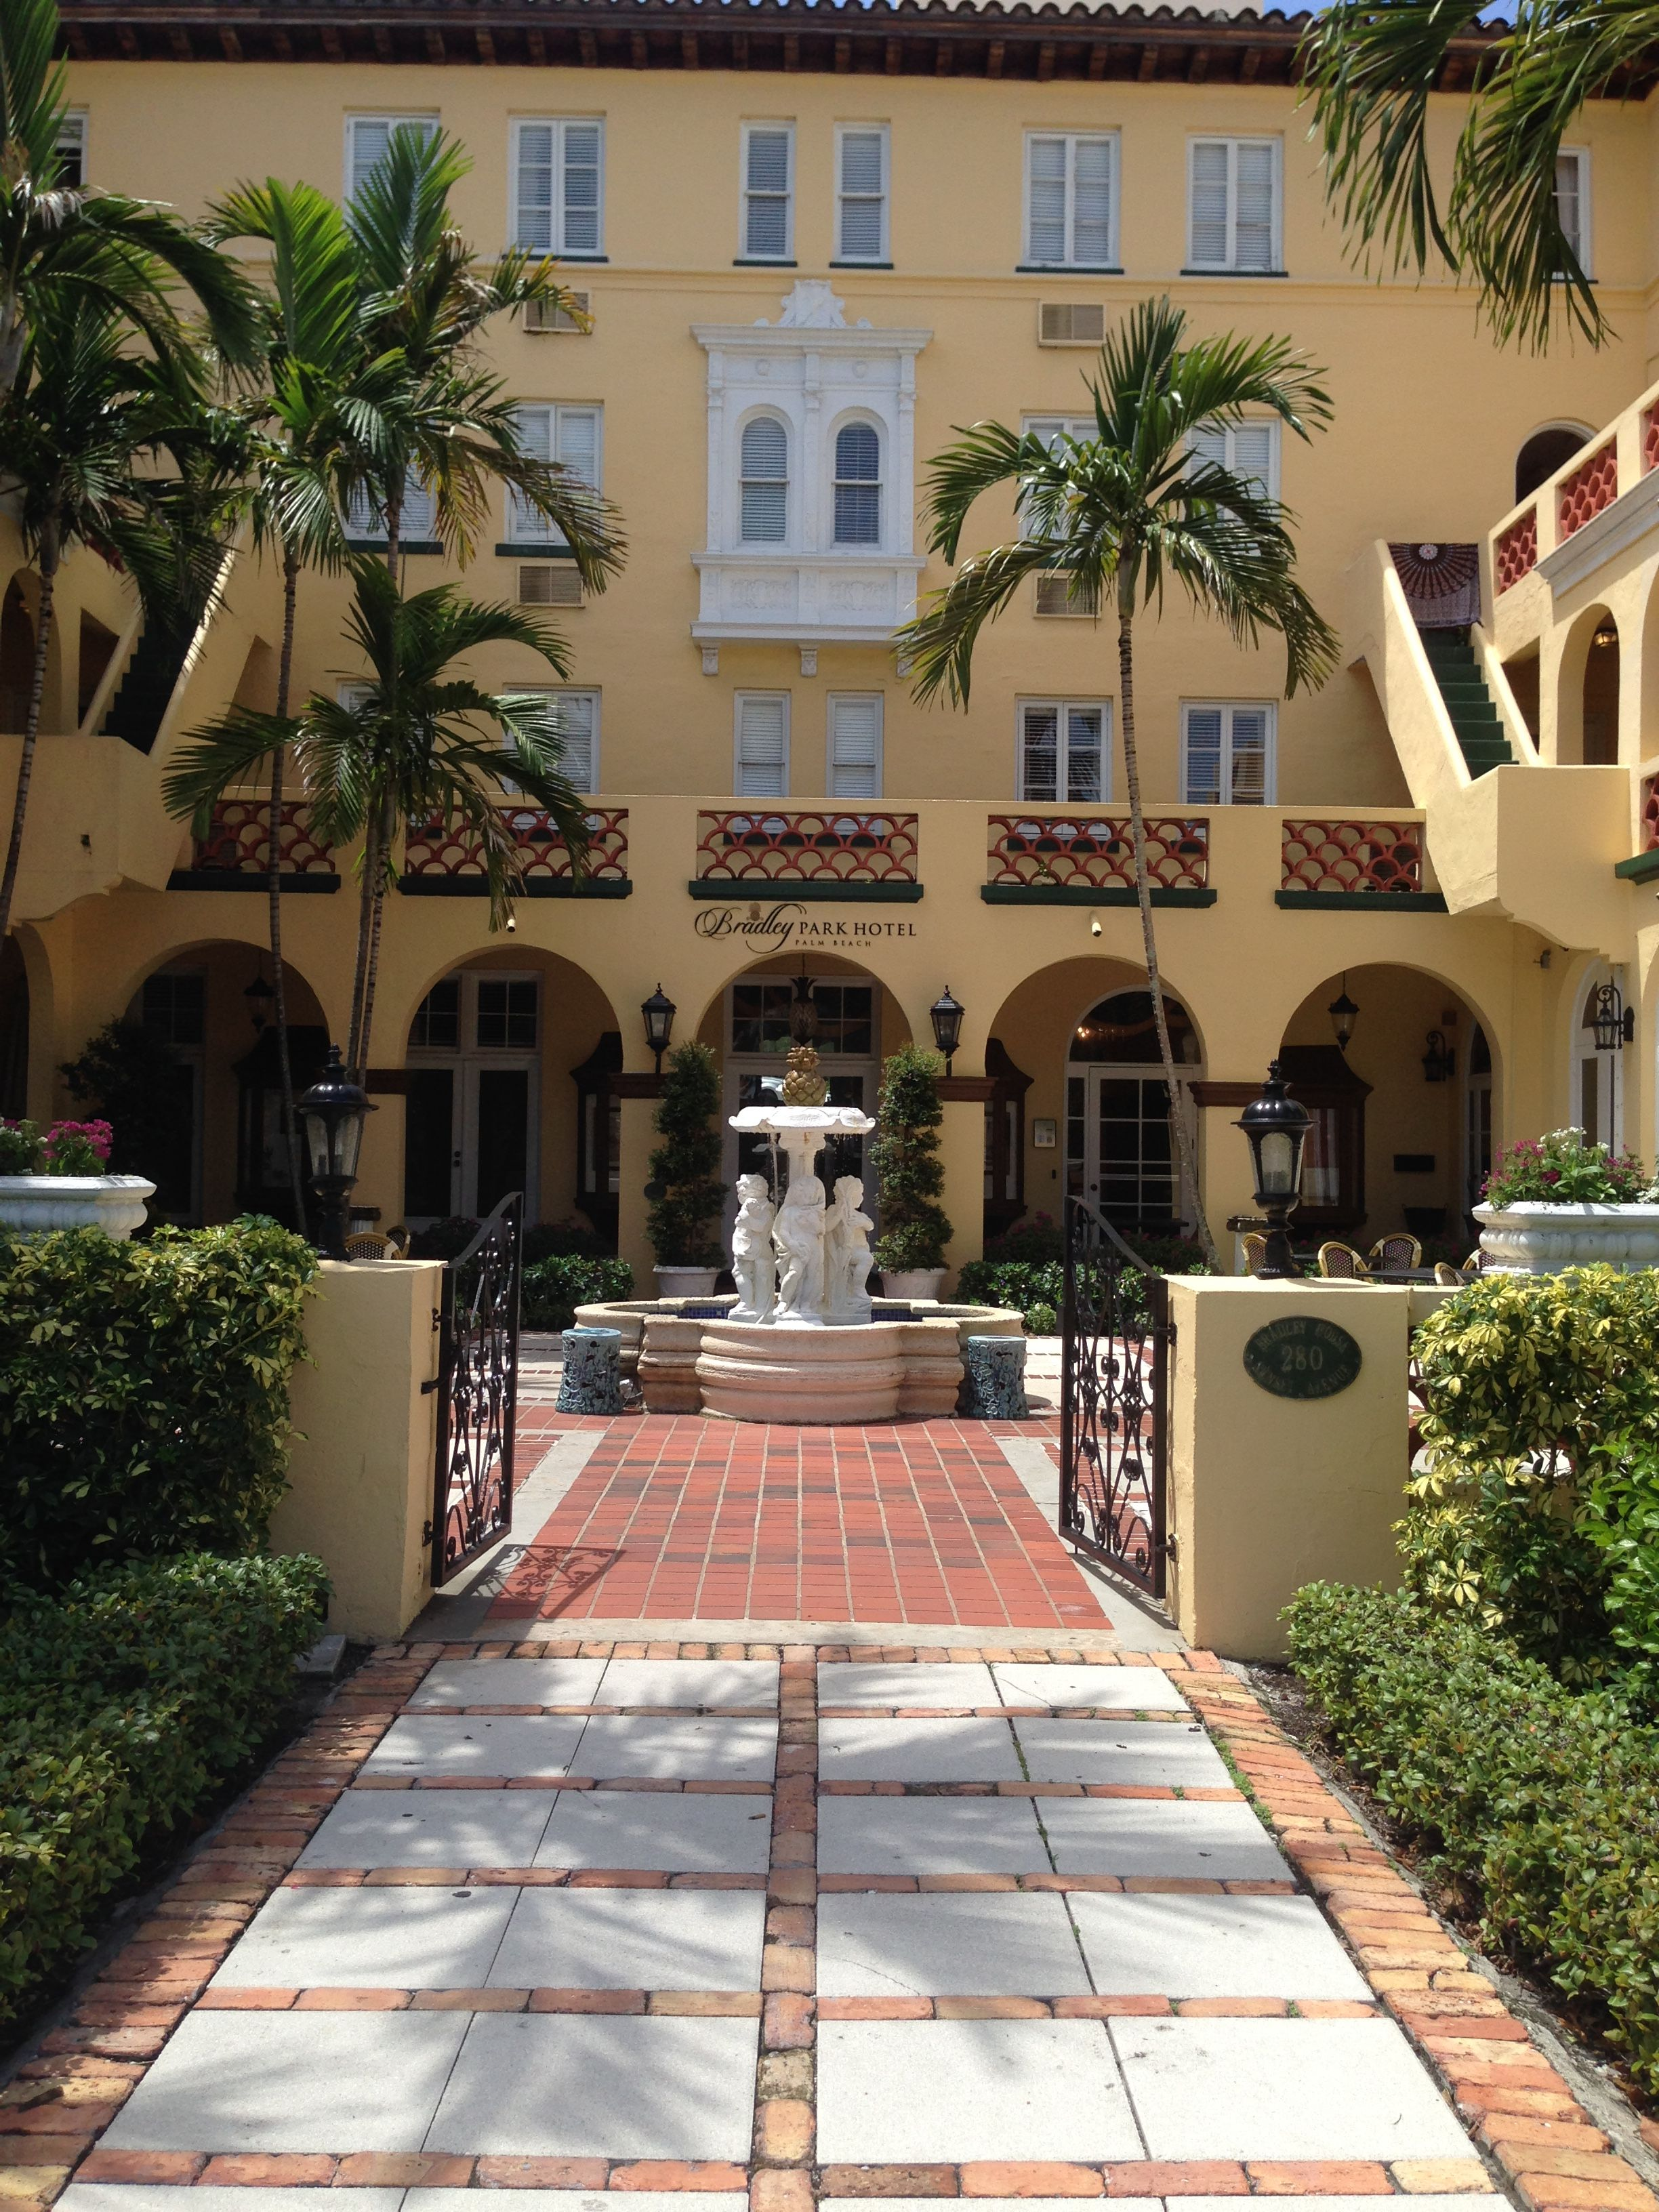 Bradley Park Hotel West Palm Beach